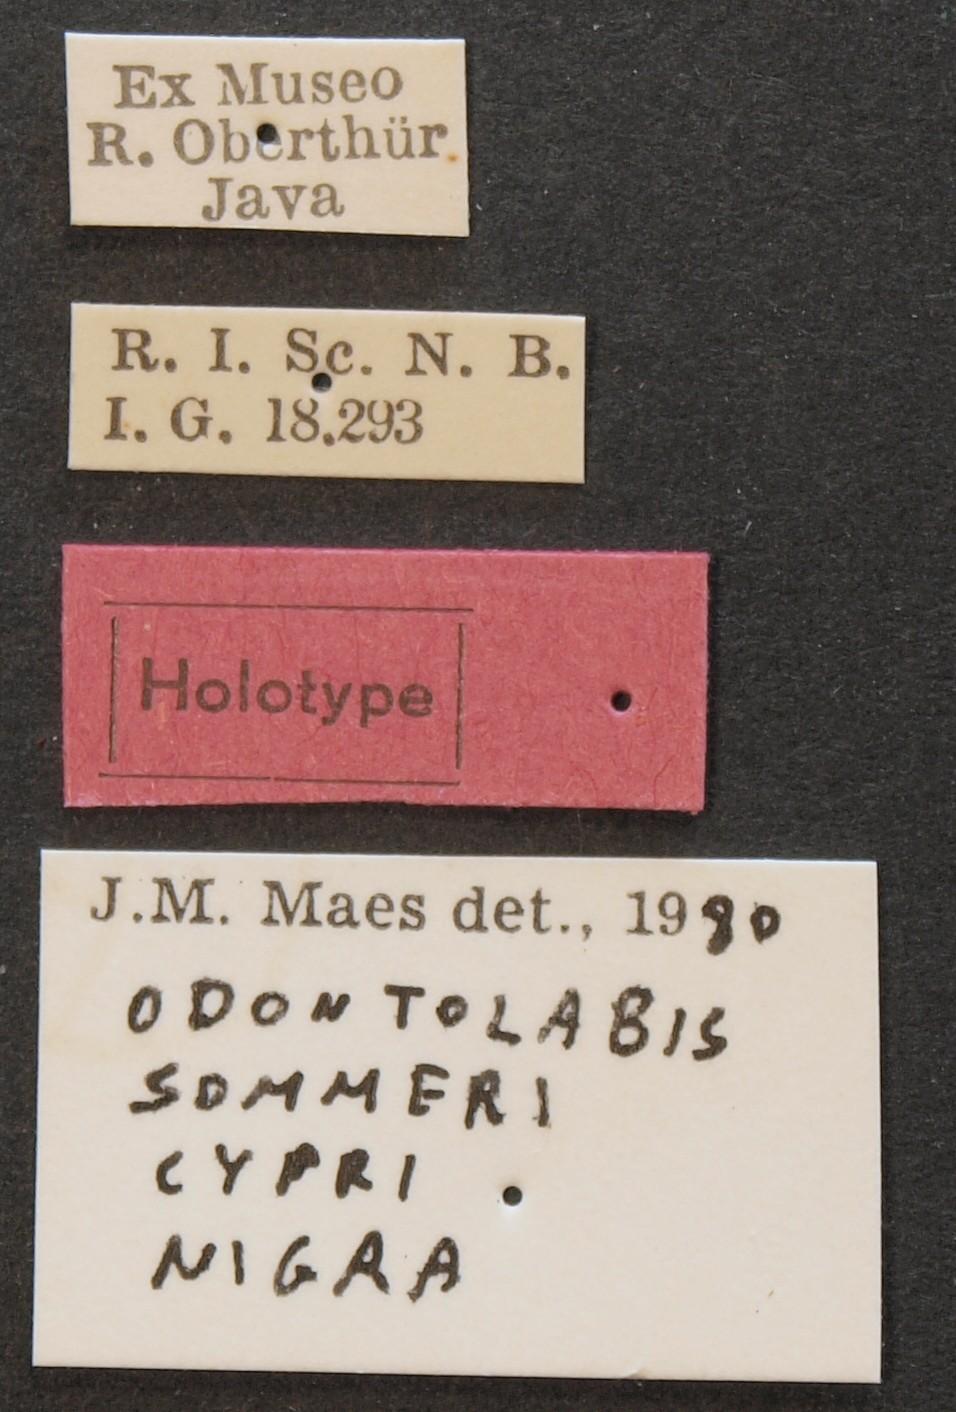 Odontolabis lowei cypri nigra ht Lb.JPG